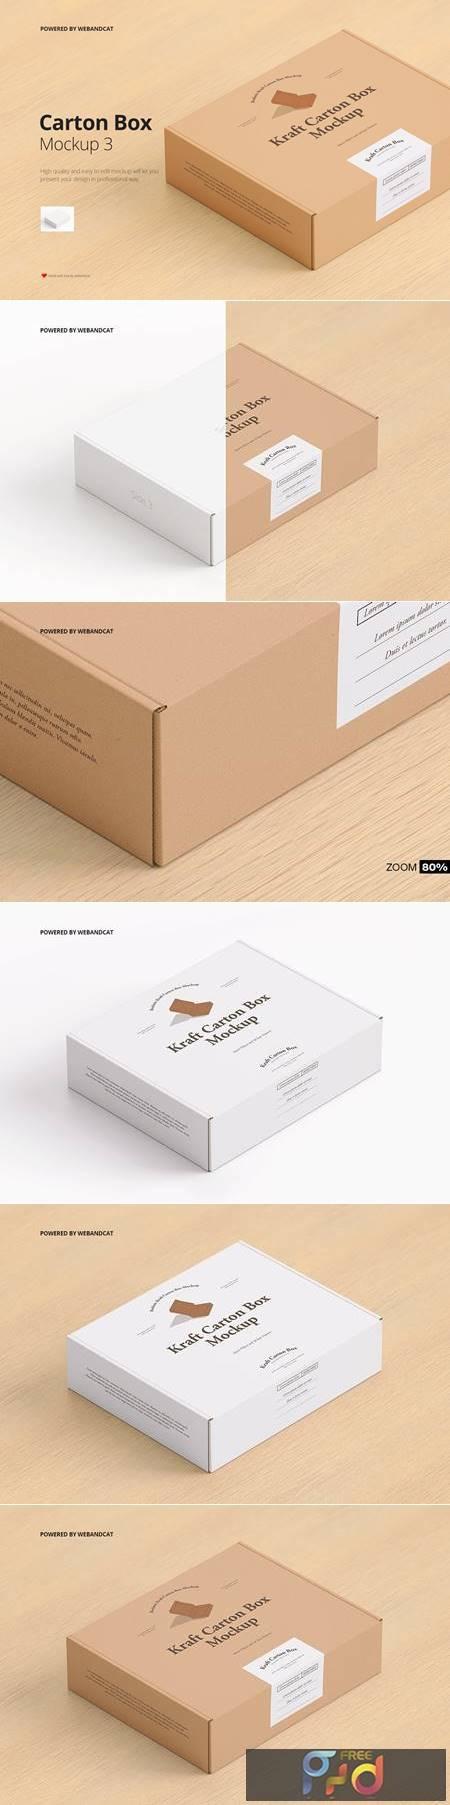 Mailing Carton Box Mockup 3 QJFPJ9V 1